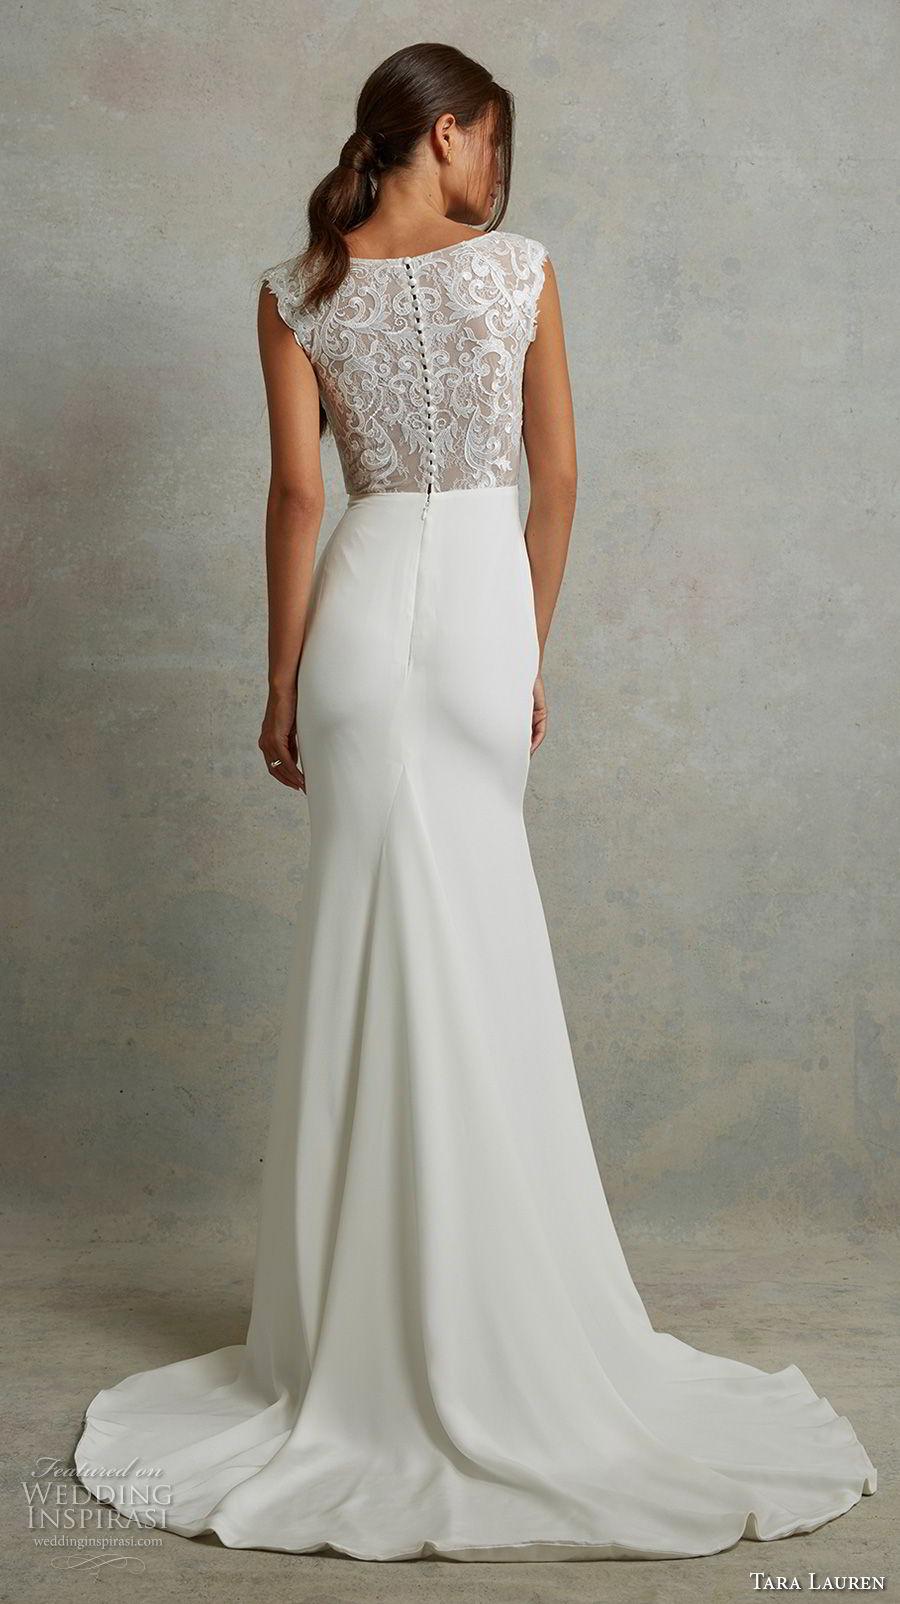 tara lauren spring 2018 bridal cap sleeves bateau neck heavily embellished bodice elegant fit and flare wedding dress covered lace back sweep train (19) bv